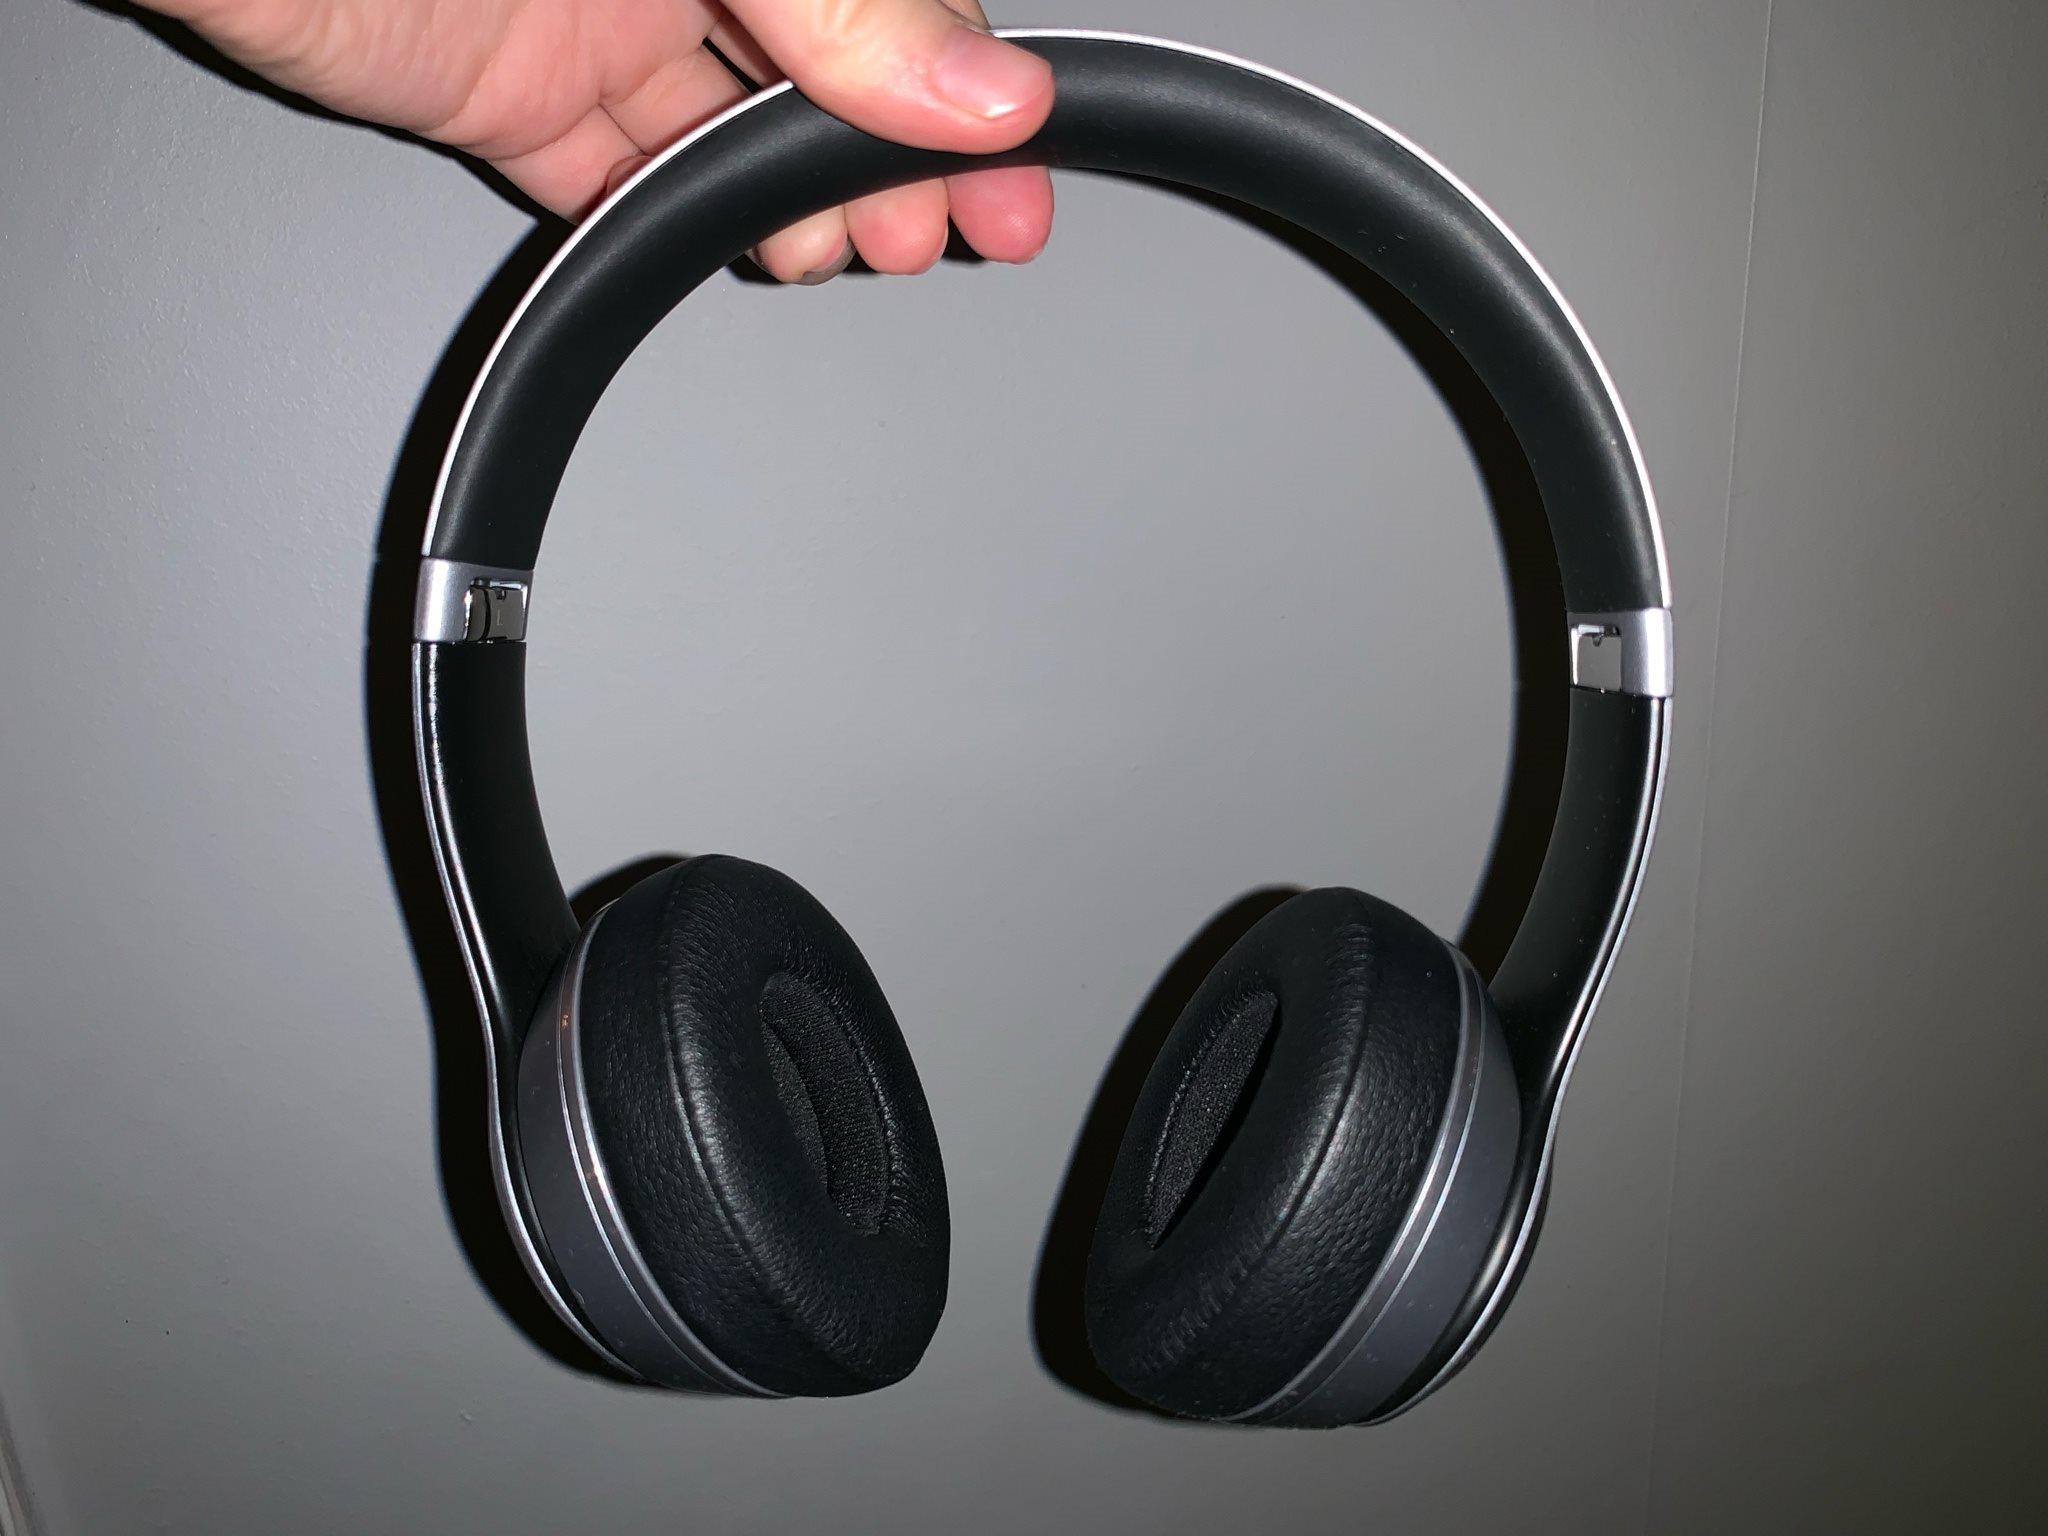 Beats Solo2 Wireless bluetooth-hörlurar (336160579) ᐈ Köp på Tradera c1f499e253b5a